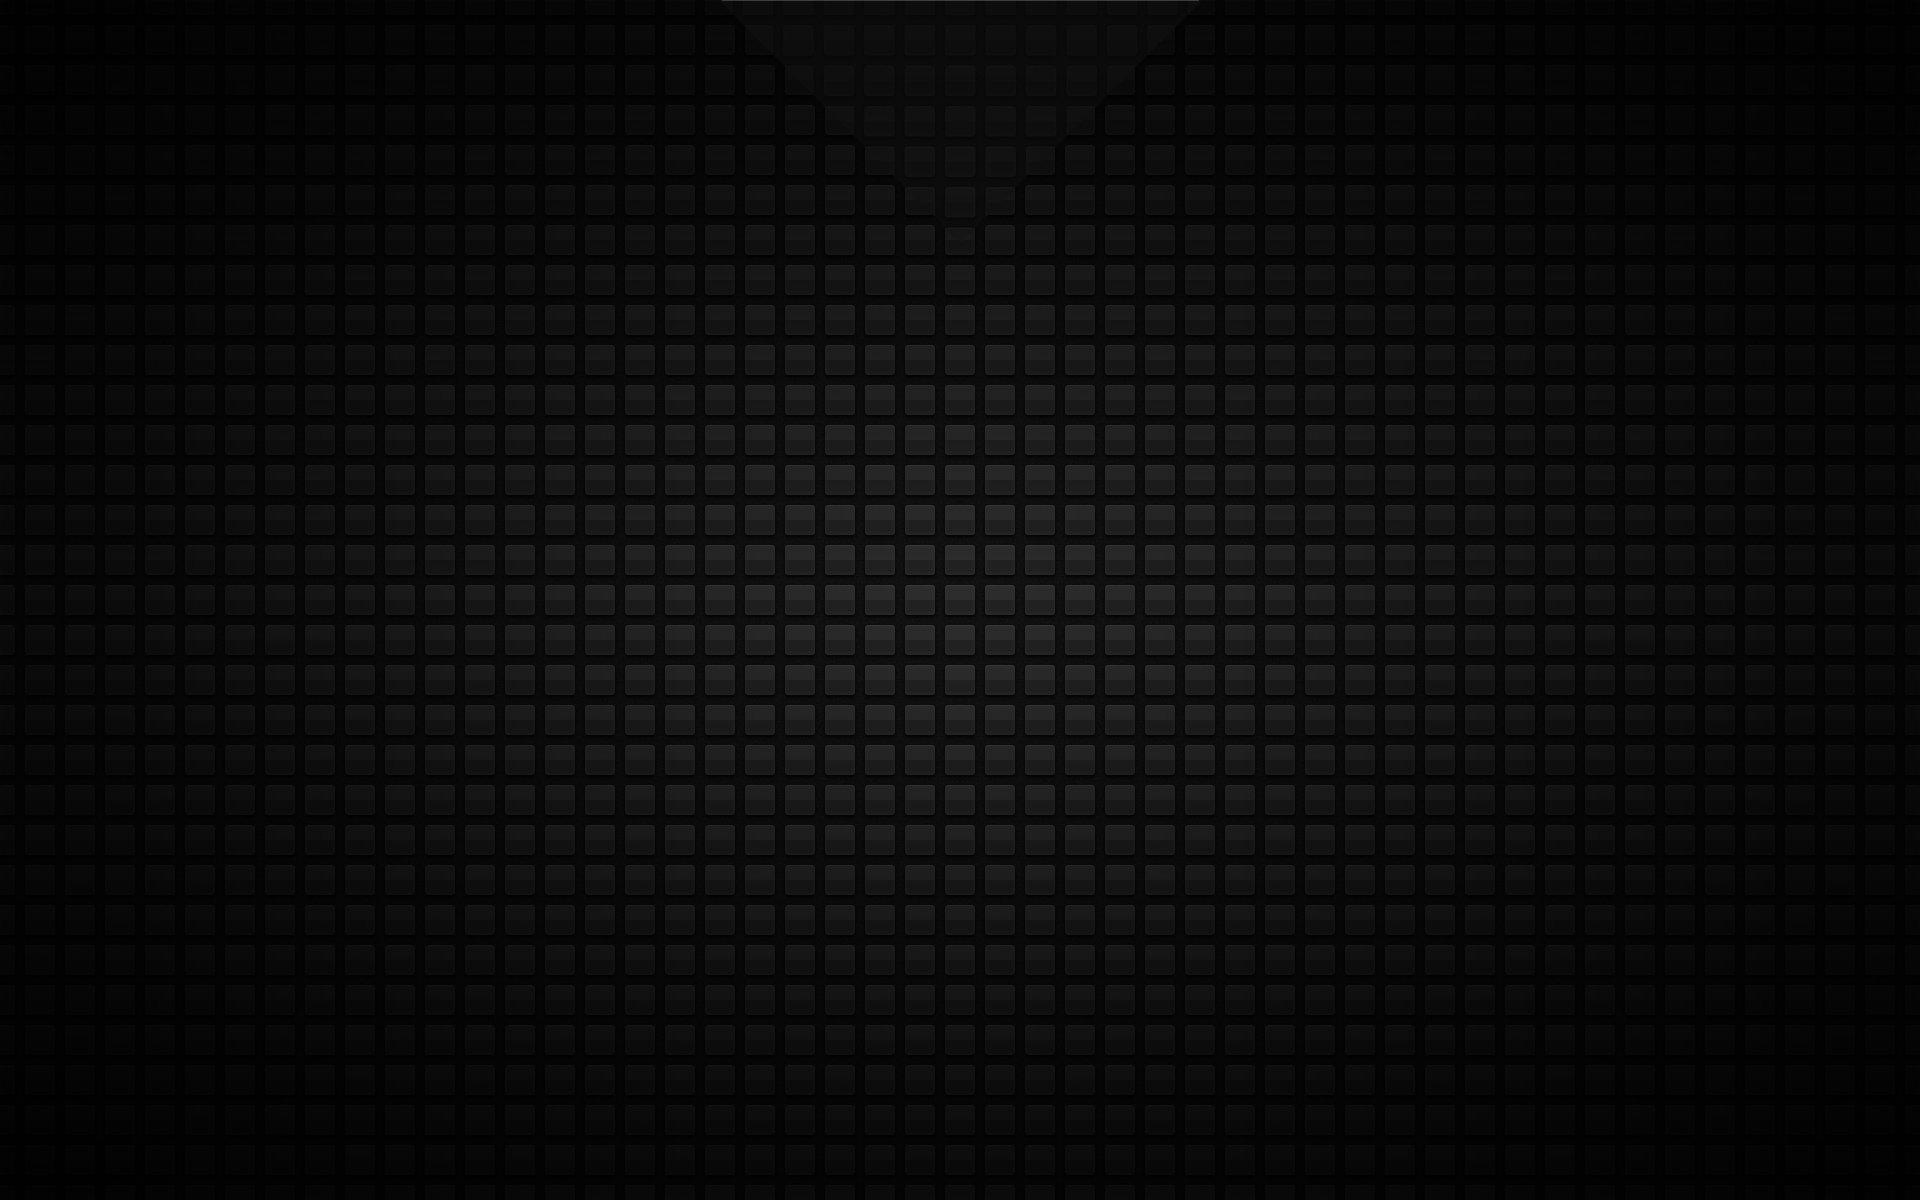 Minimalist Modern House Free Black Background Wallpaper Wallpapersafari